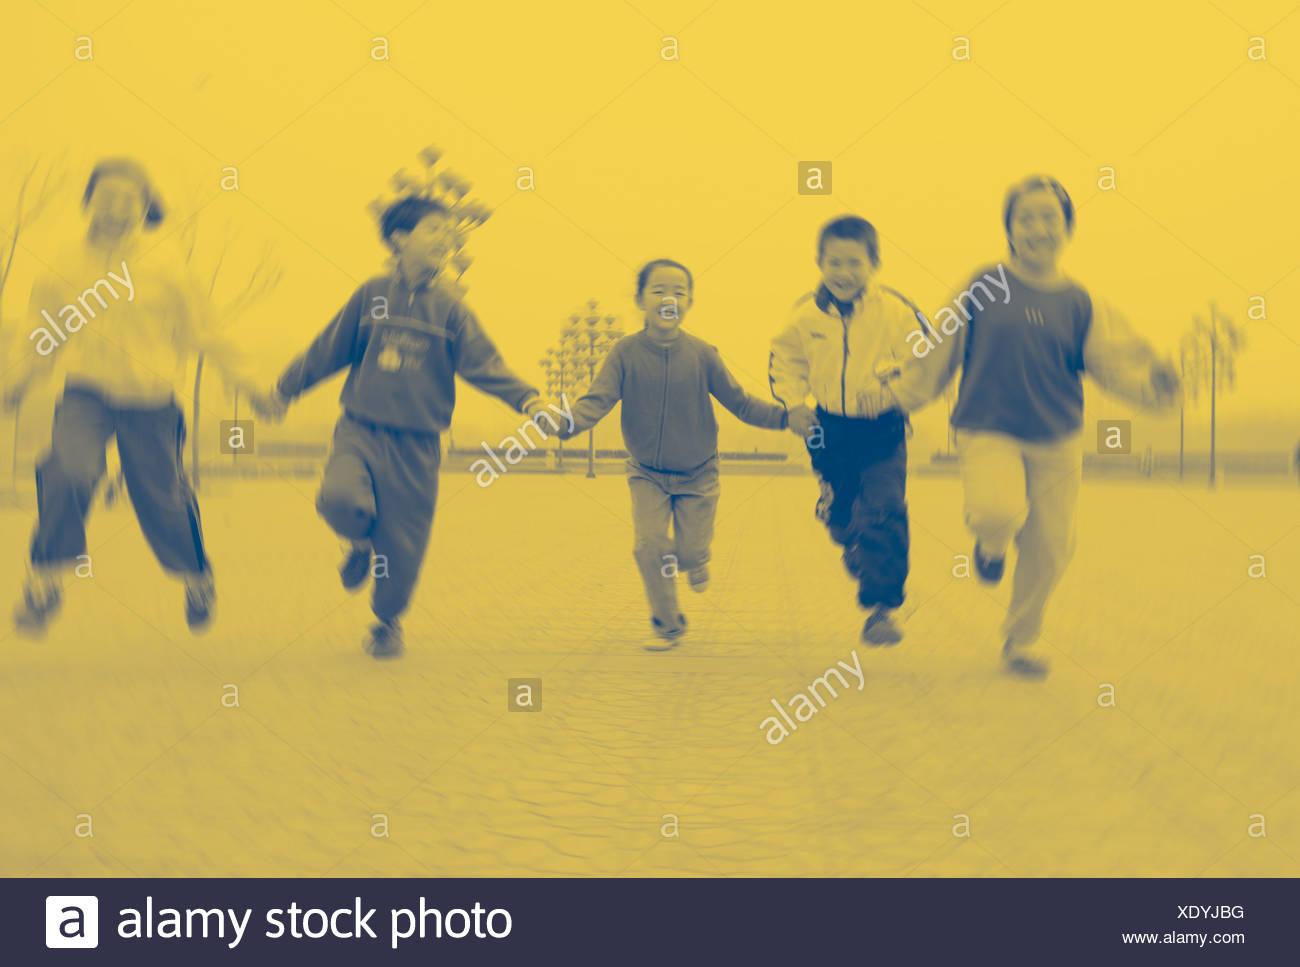 Children running hand in hand in school yard - Stock Image